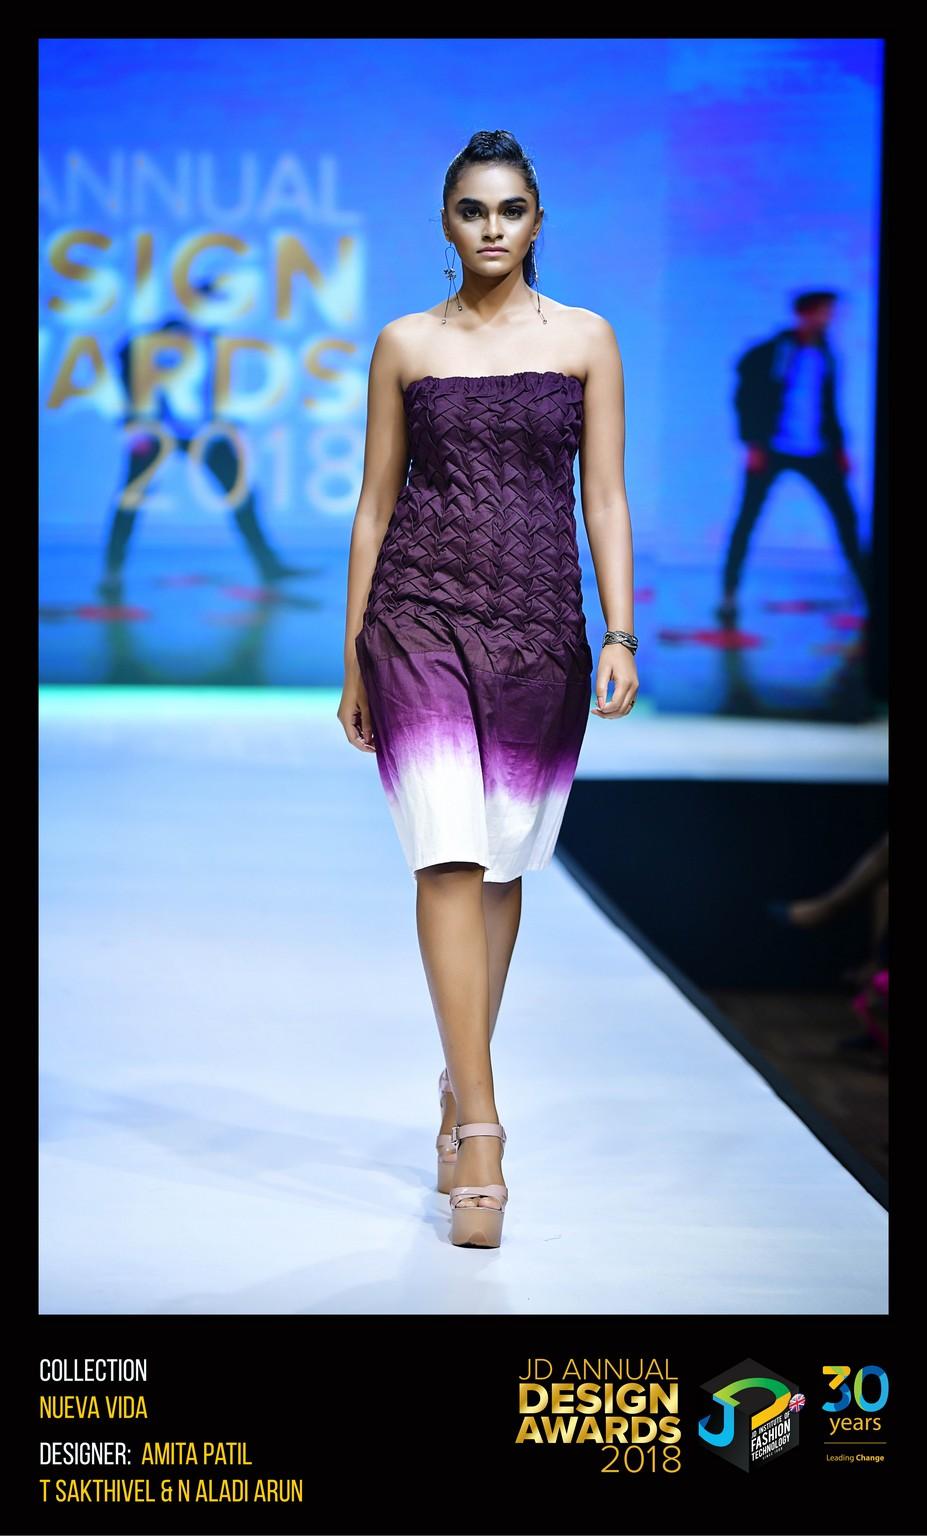 Nueva Vida – Change – JD Annual Design Awards 2018   Designer: Shakthi, Arun and Amitha   Photography : Jerin Nath (@jerin_nath) nueva vida - NUEVA VIDA 4 - Nueva Vida – Change – JD Annual Design Awards 2018